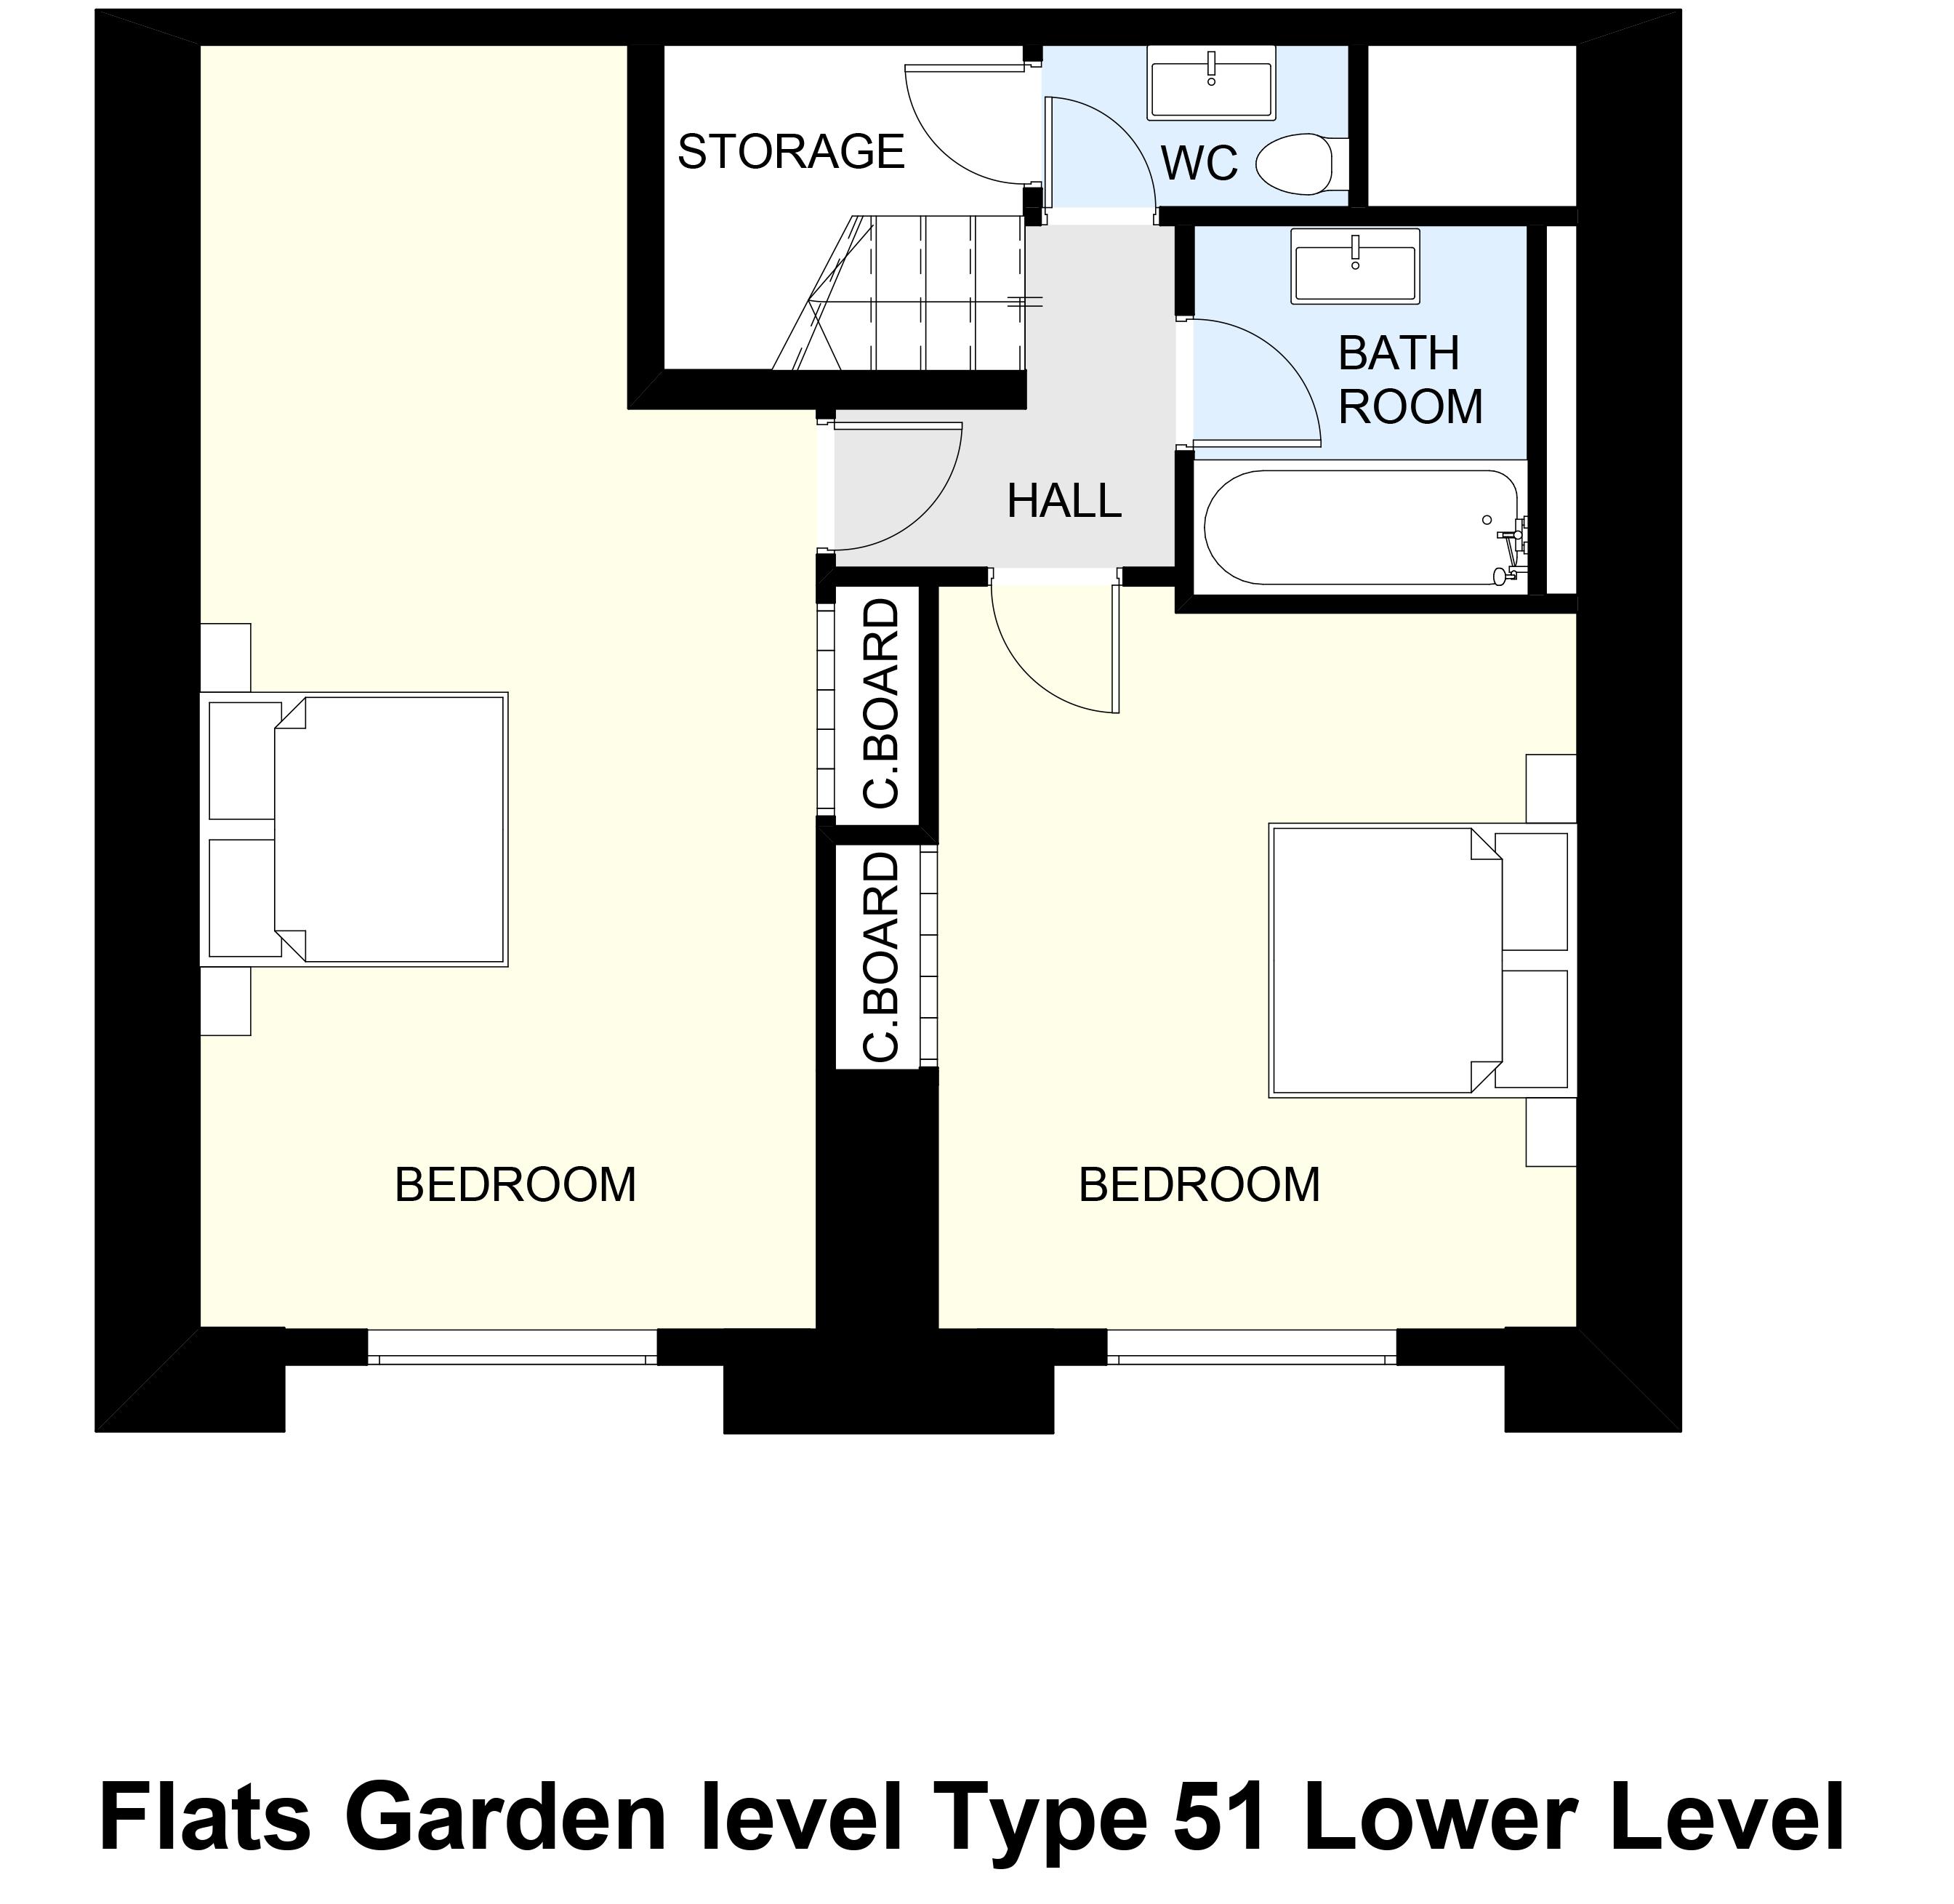 Flats Garden level Type 51 Lower Level